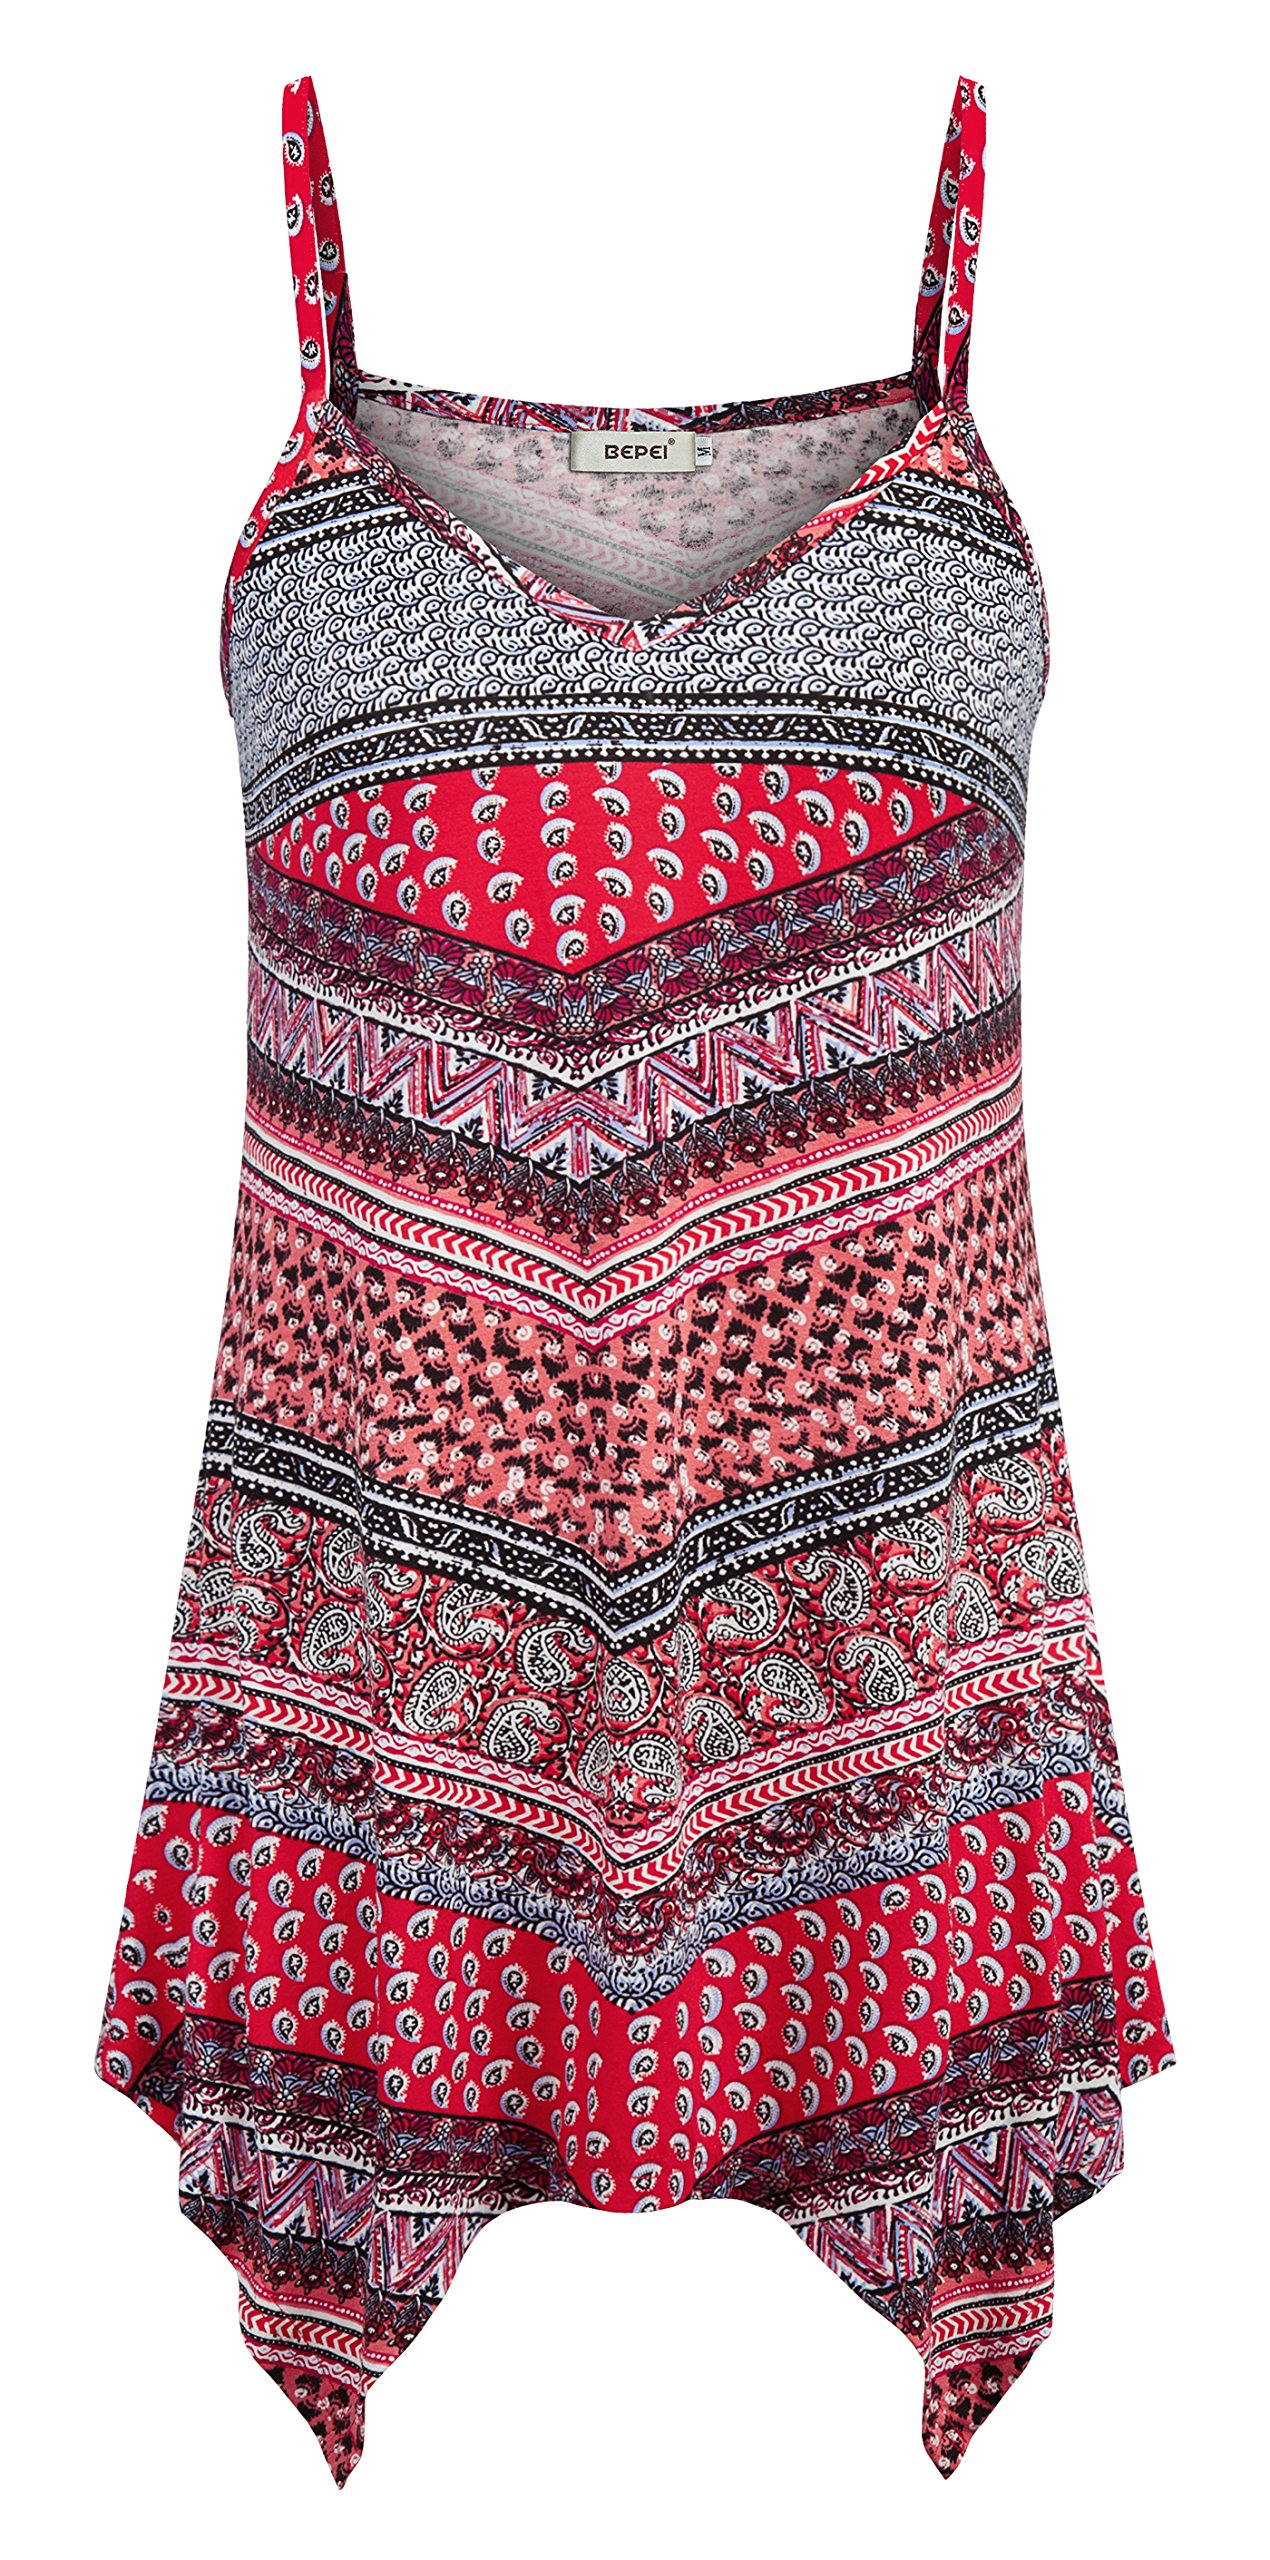 d09af443f56054 BEPEI Sleeveless Floral Shirts for Women,Ladies Stylish Spaghetti Strap  Camisoles Tank Print Breezy Loose Botttom Ruffles Tunics Summer Basic V  Neck Tops ...